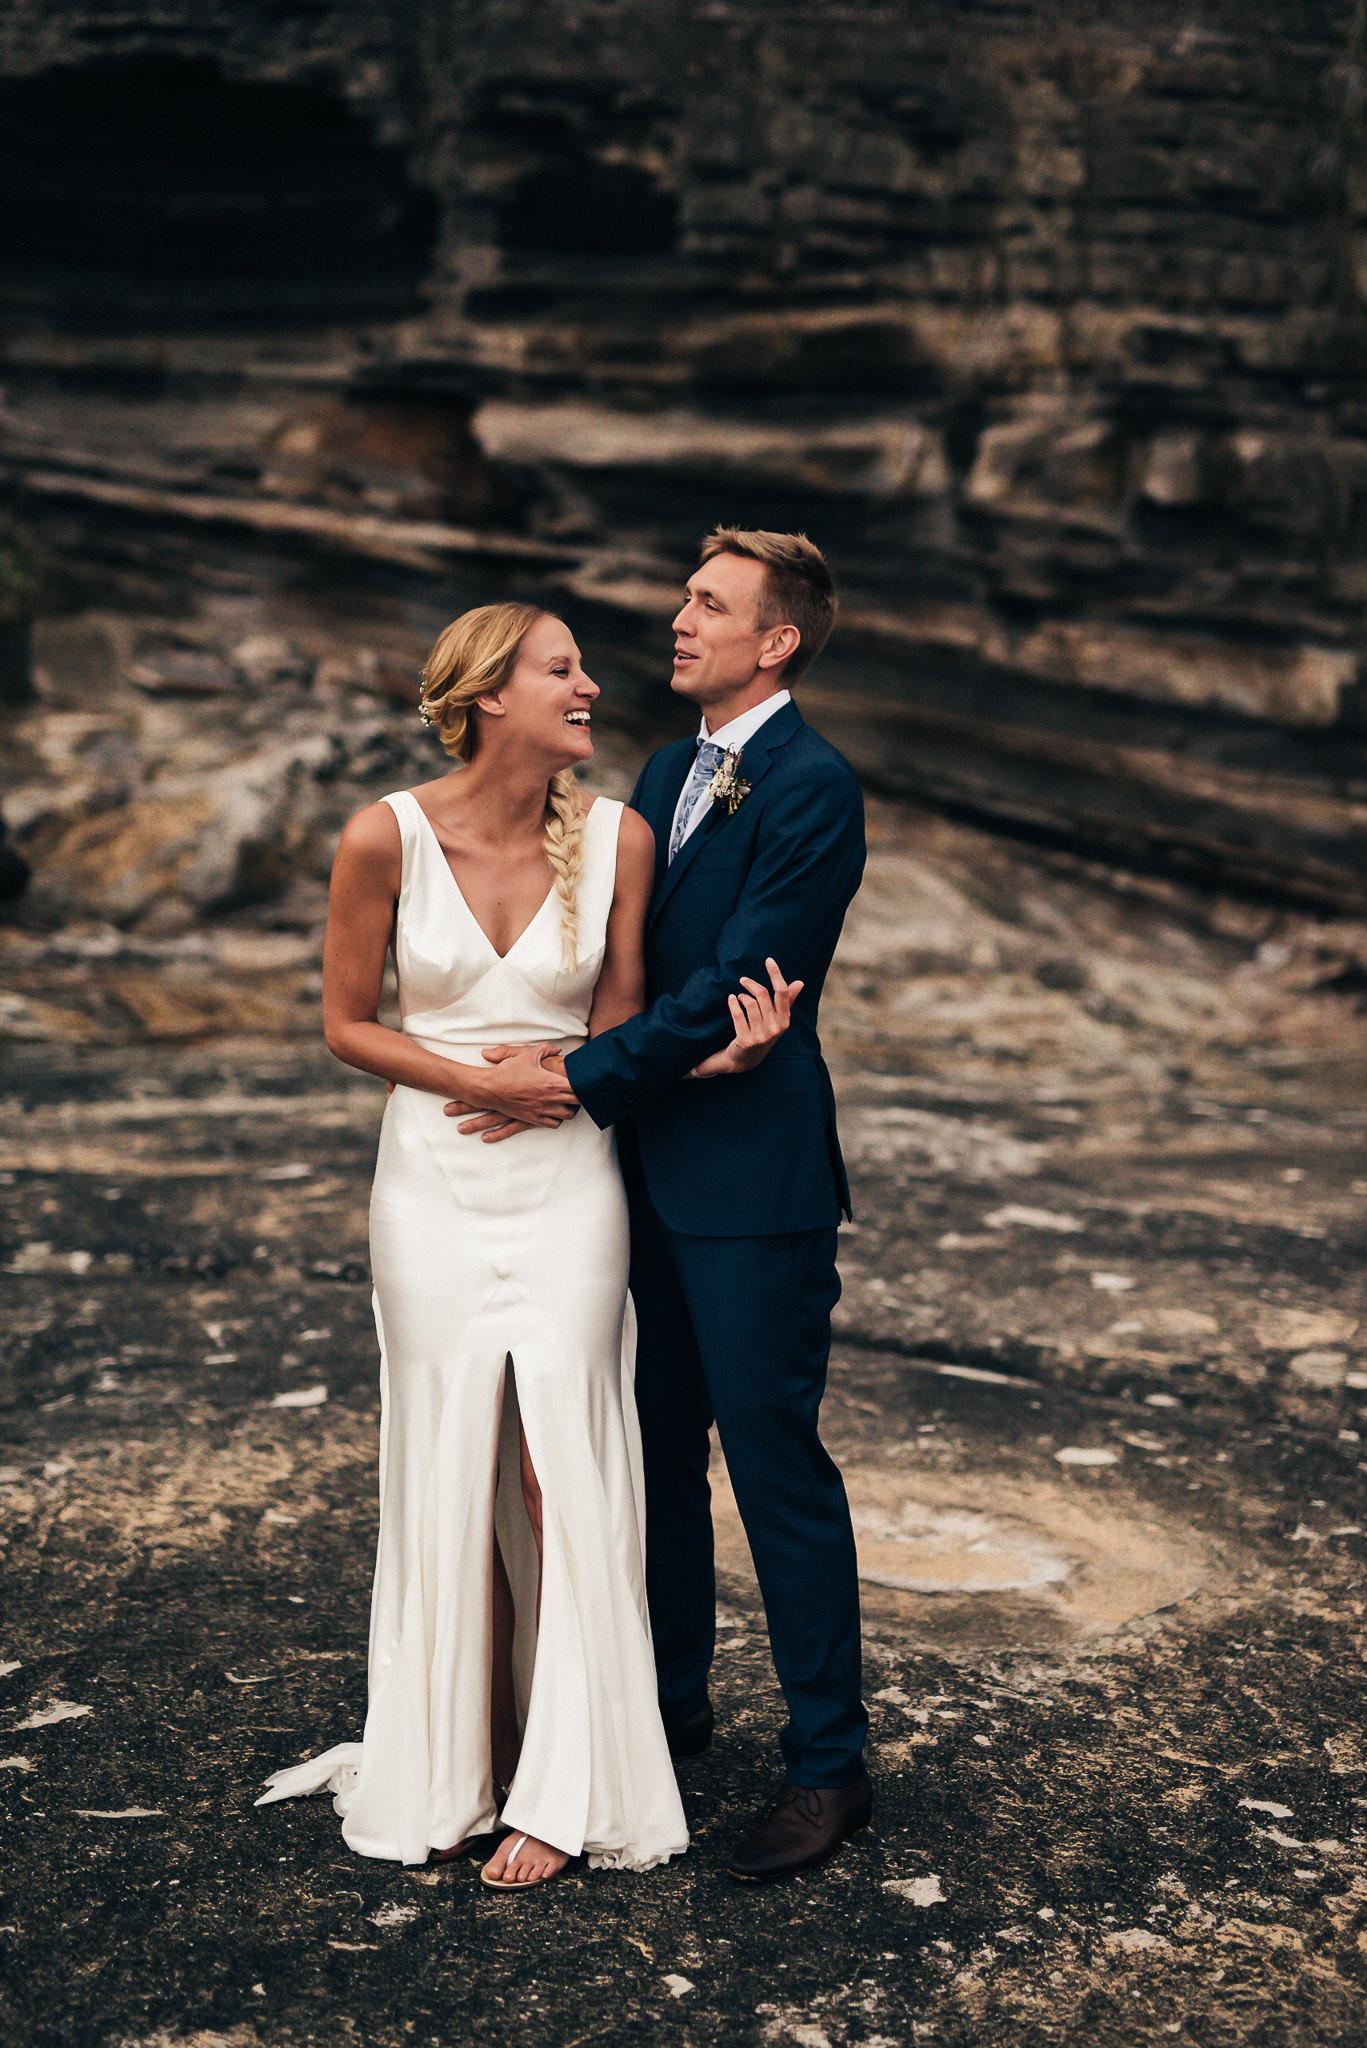 Sydney Wedding Photographer (141 of 182).jpg